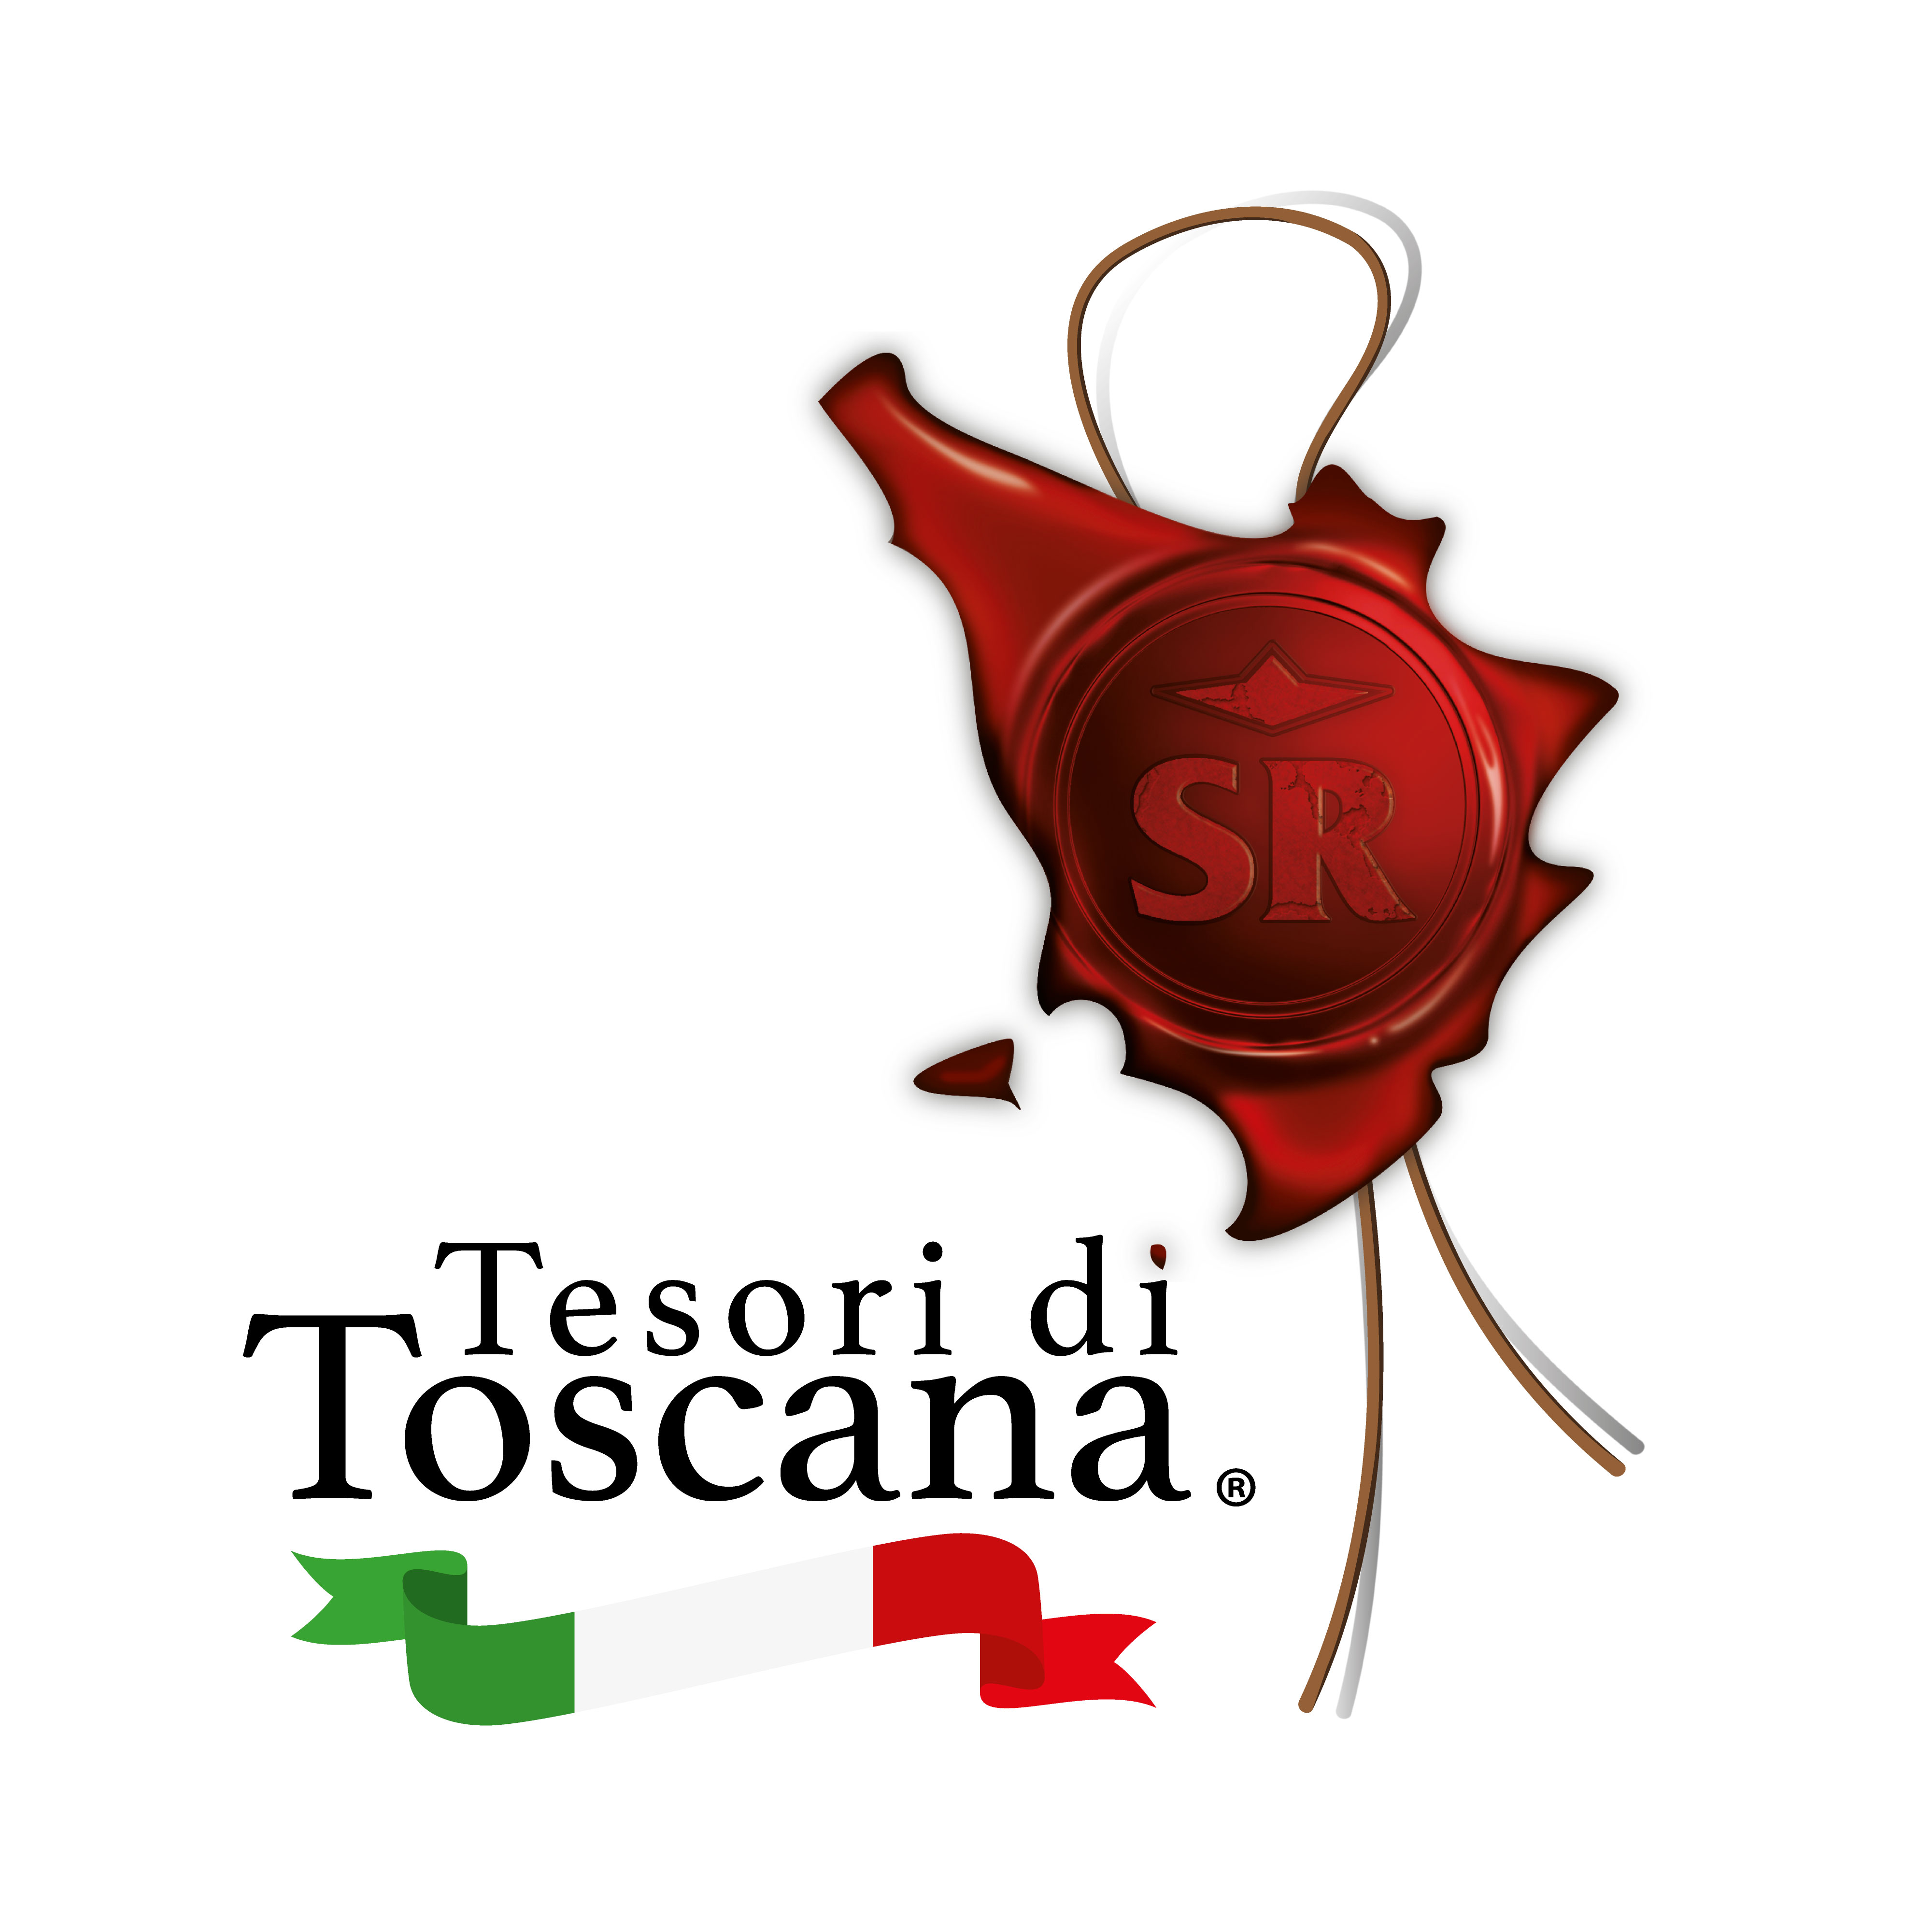 Tesori di Toscana – Logo